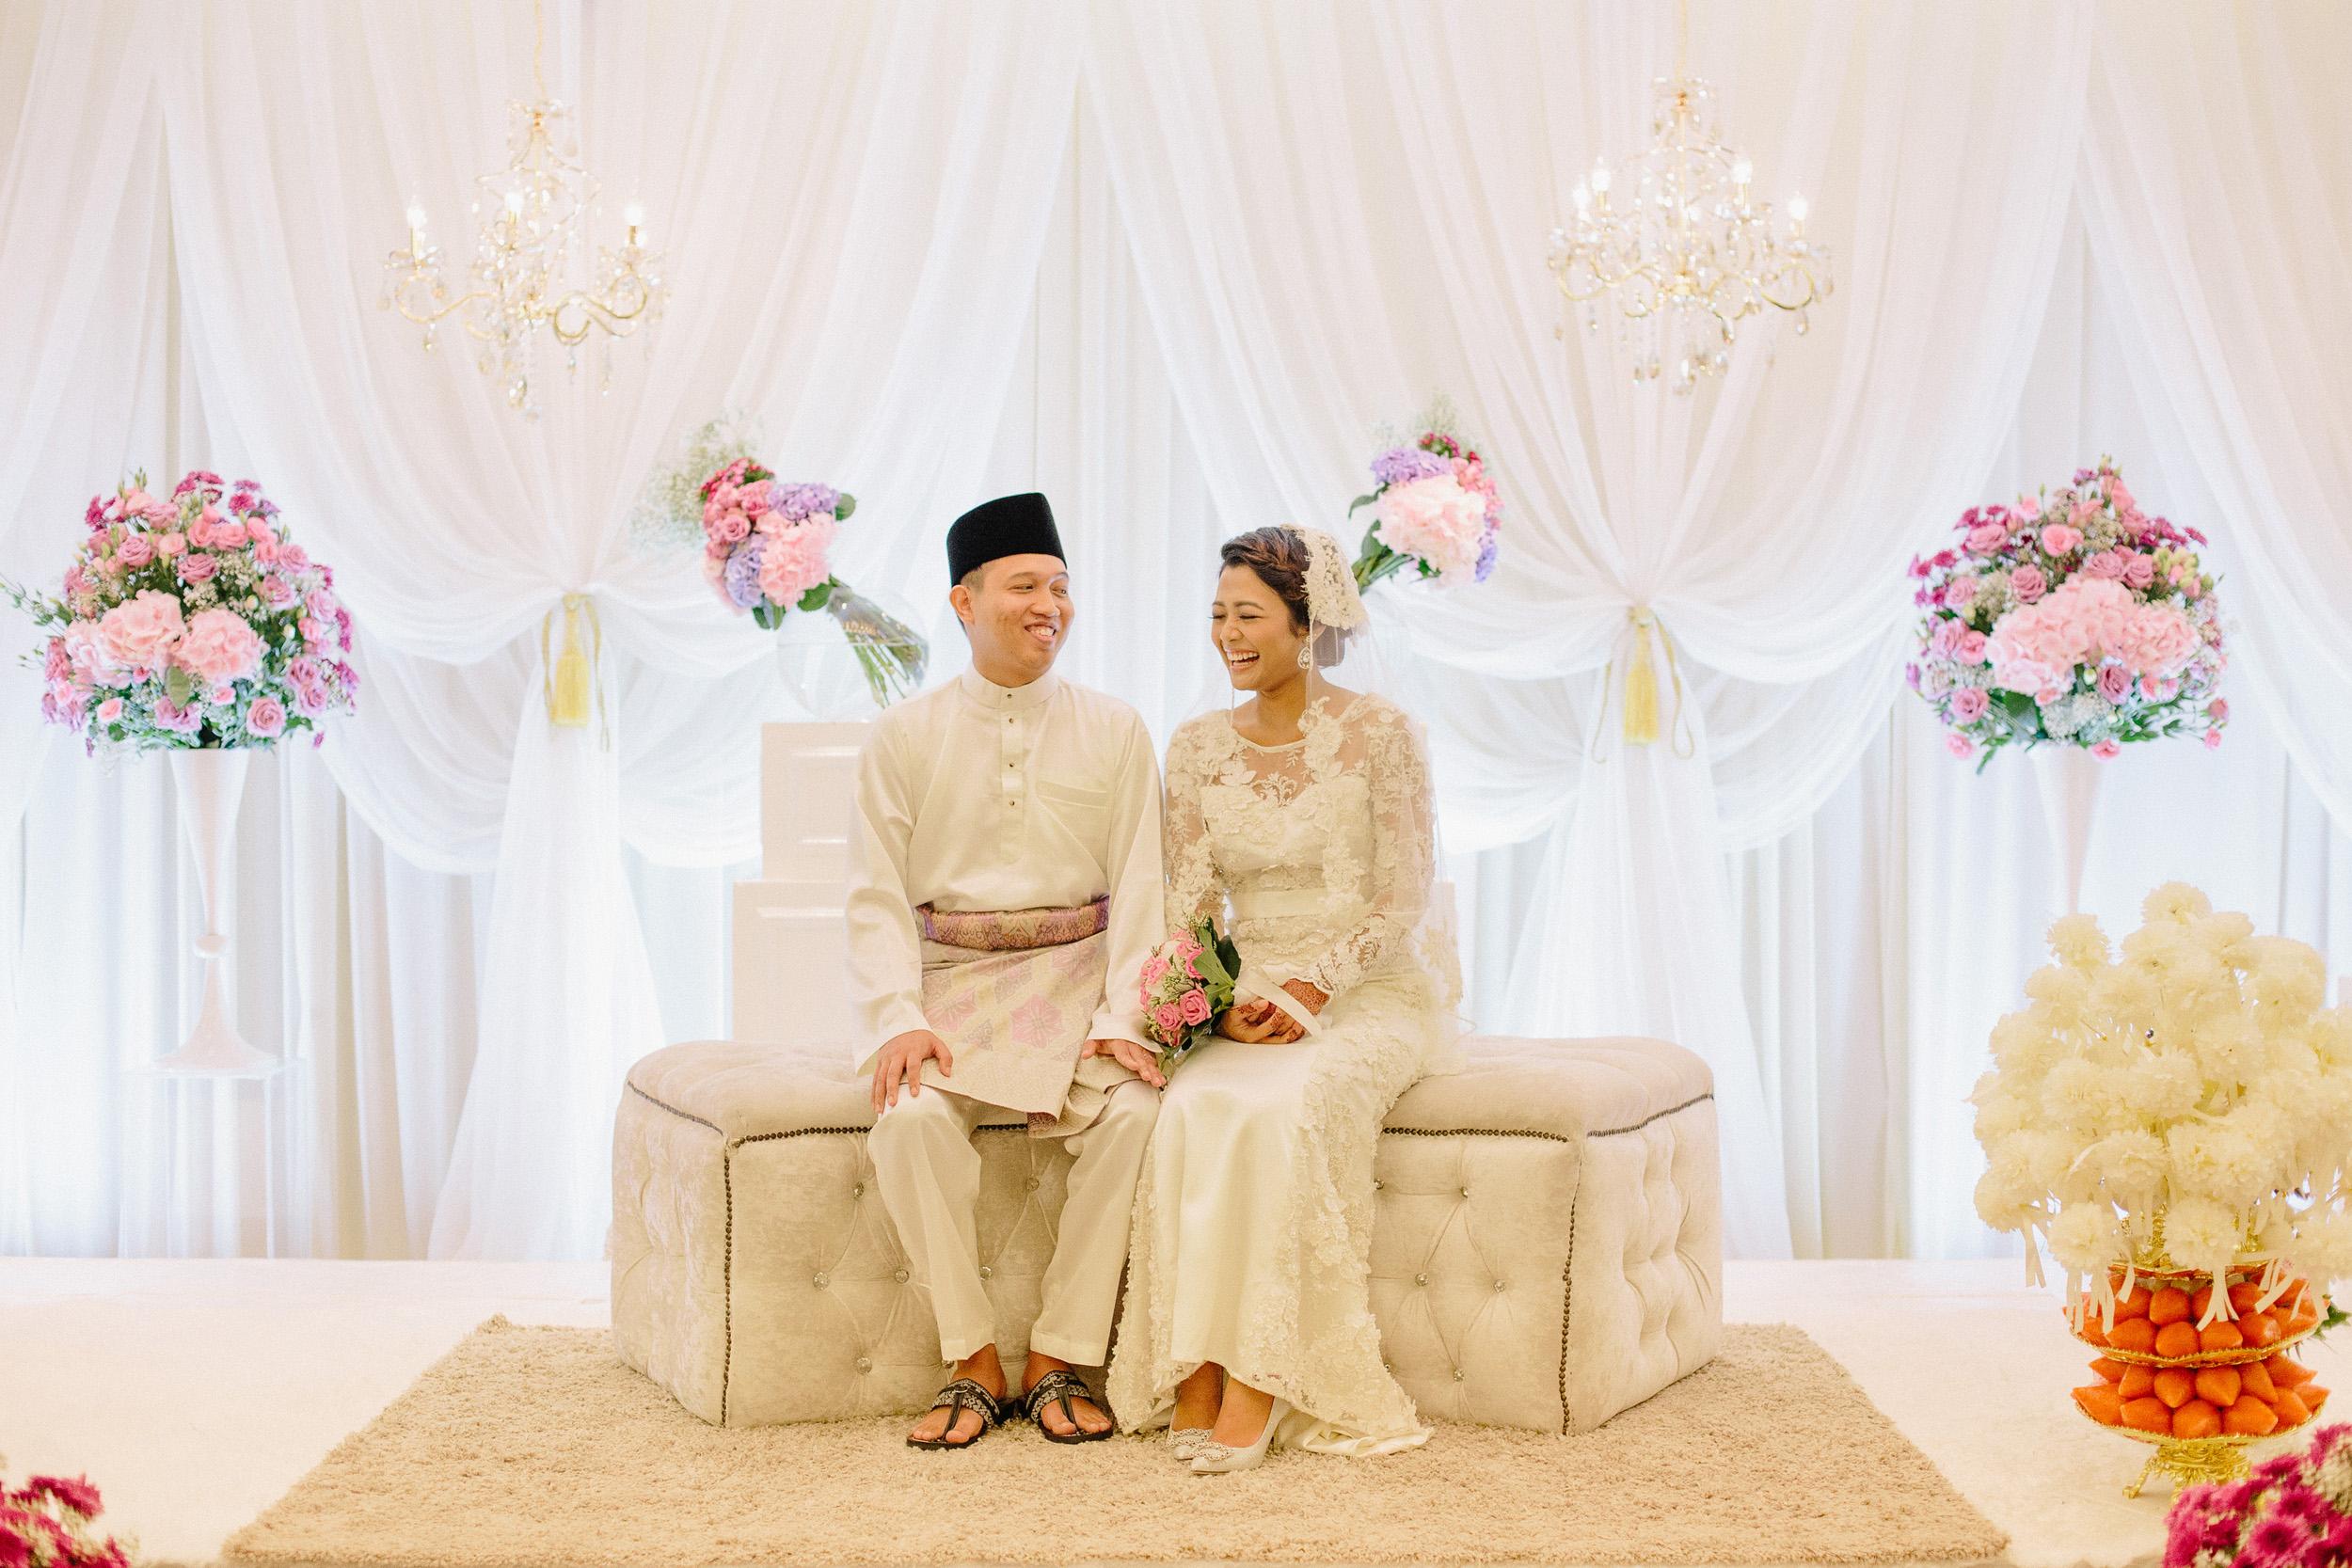 singapore-wedding-photographer-photography-wmt2017-069.jpg